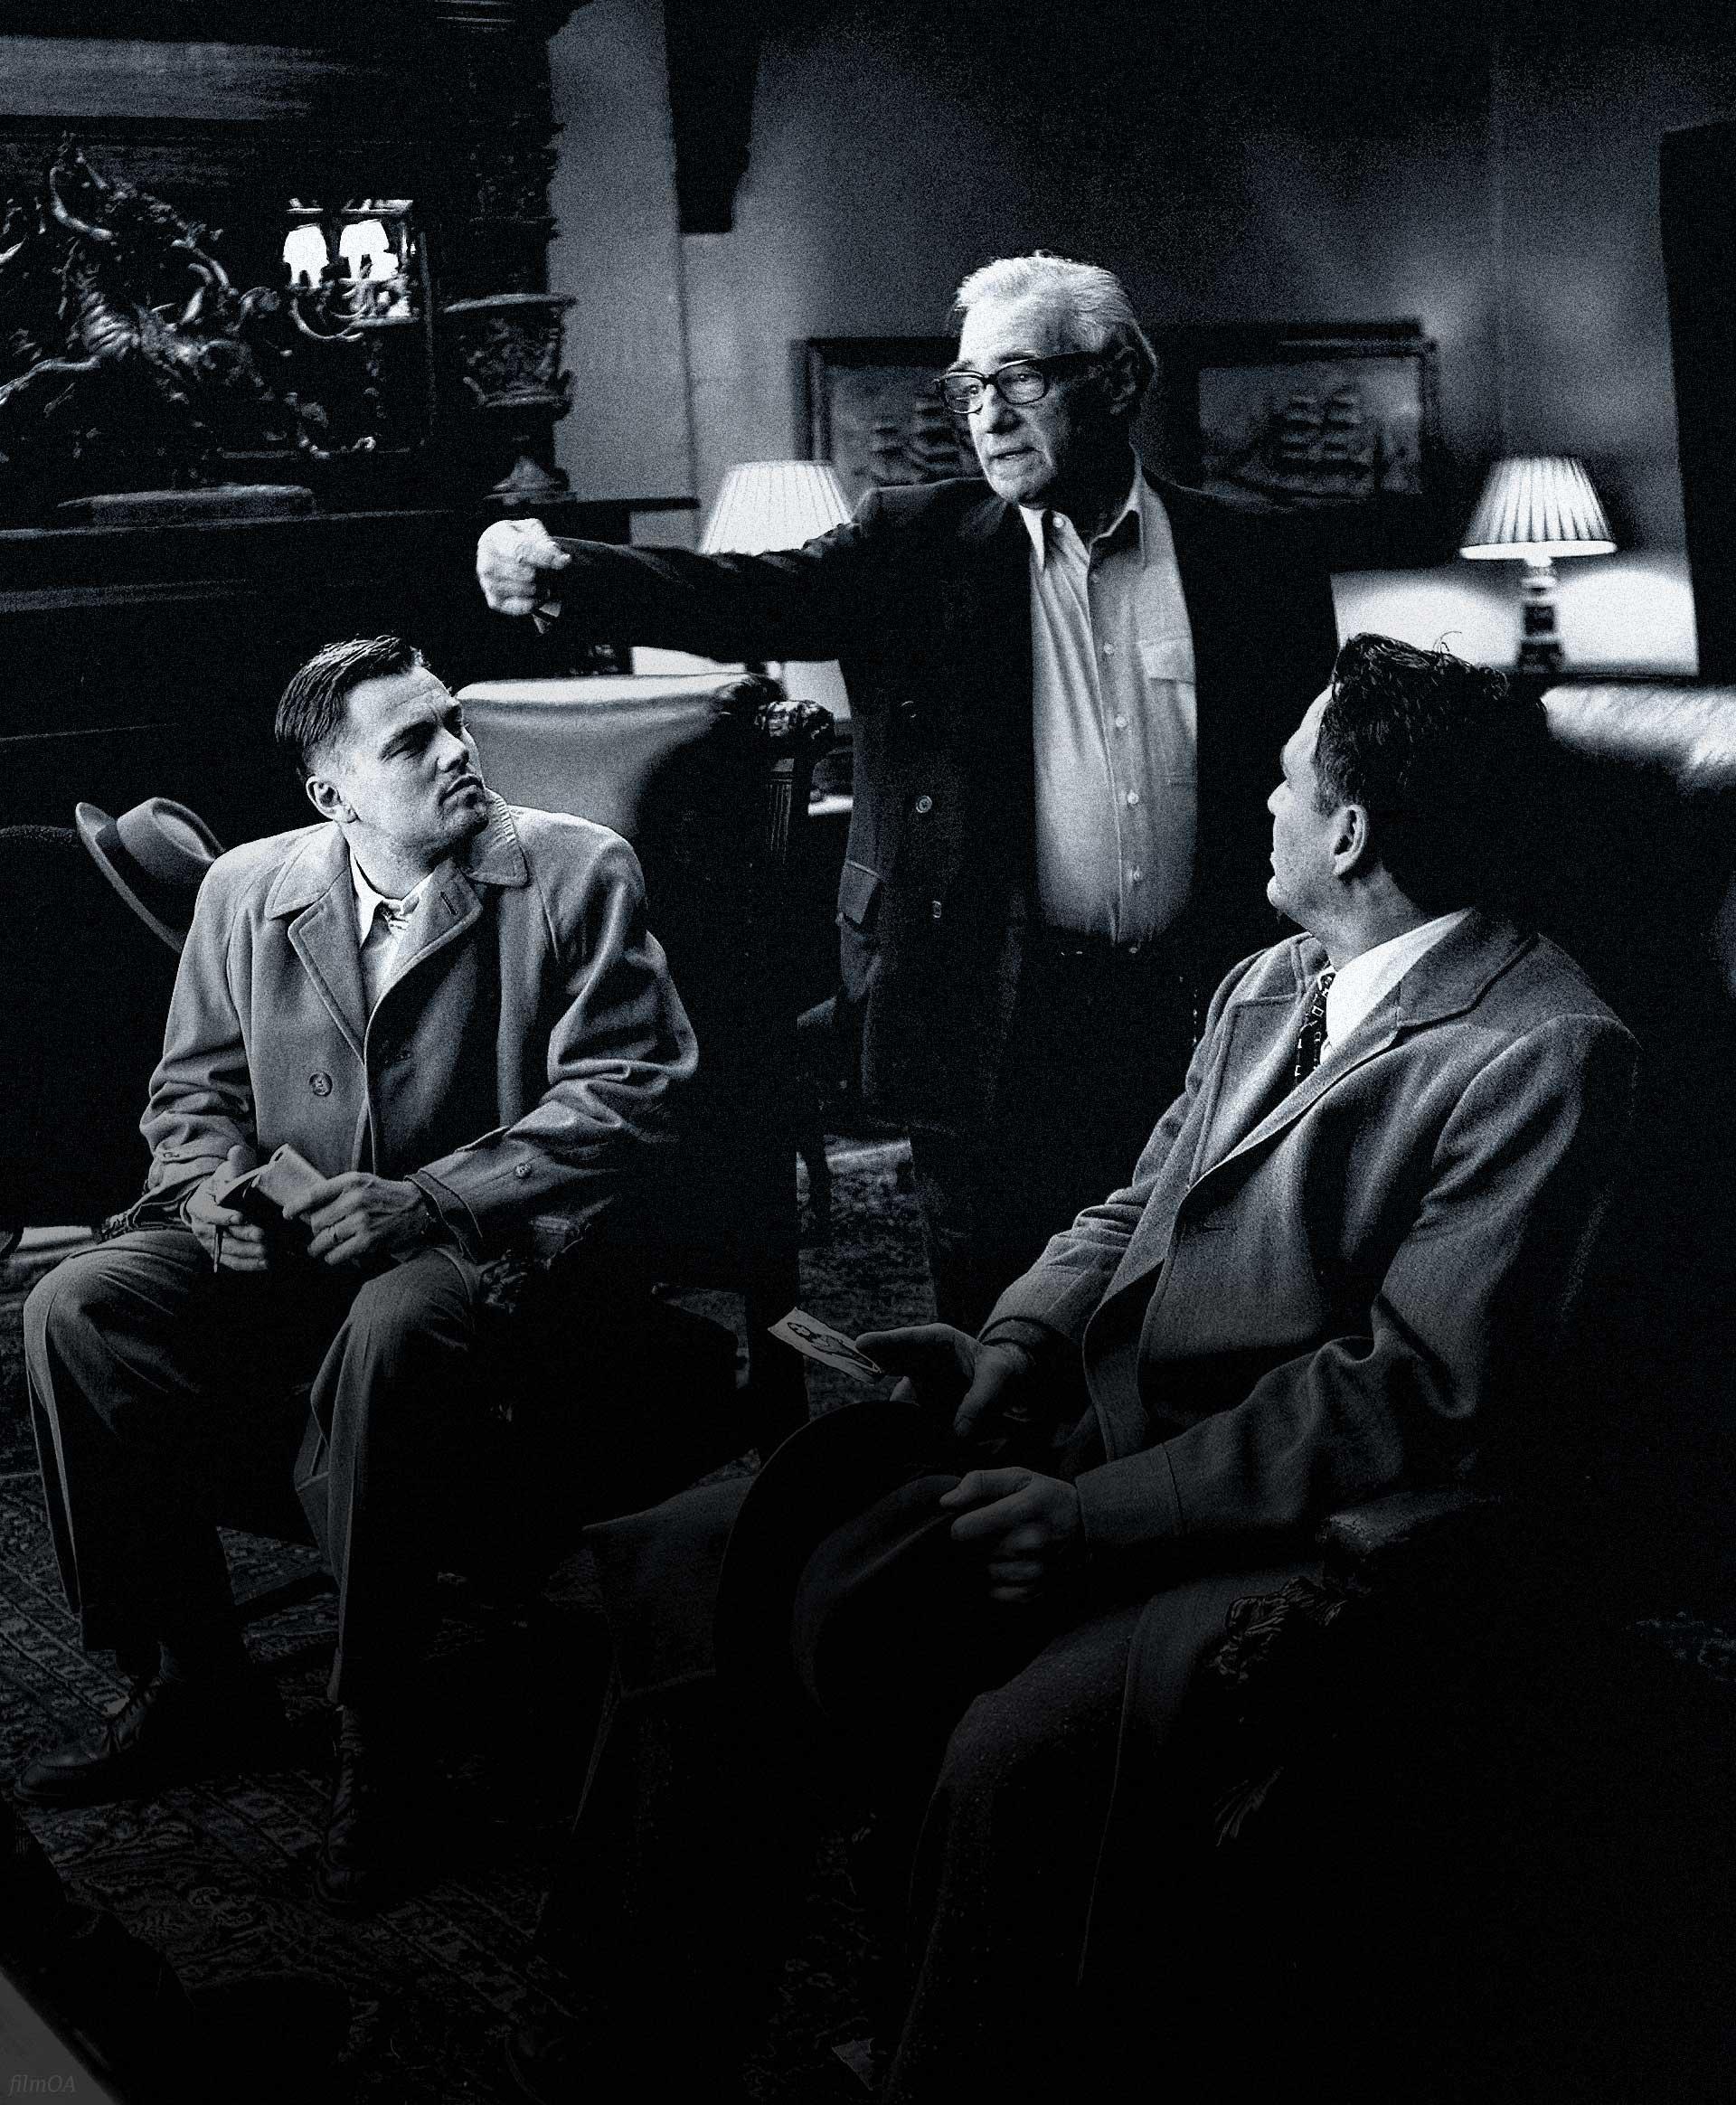 Martin Scorsese directing Leonardo DiCaprio black and white Leonardo Dicaprio